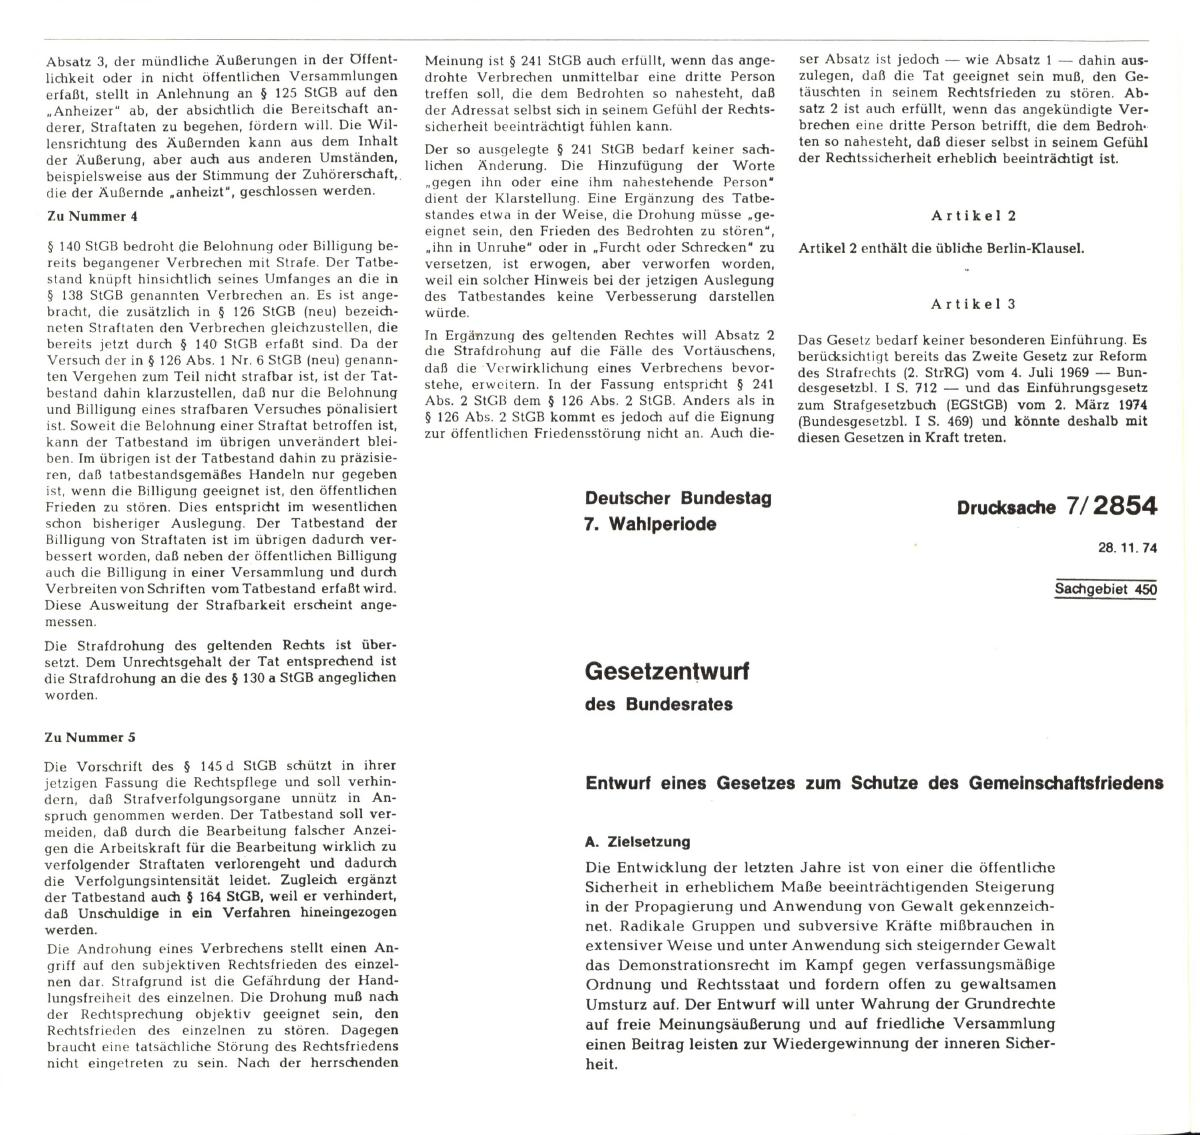 REP_VLB_1976_Die_Zensurgesetze_51